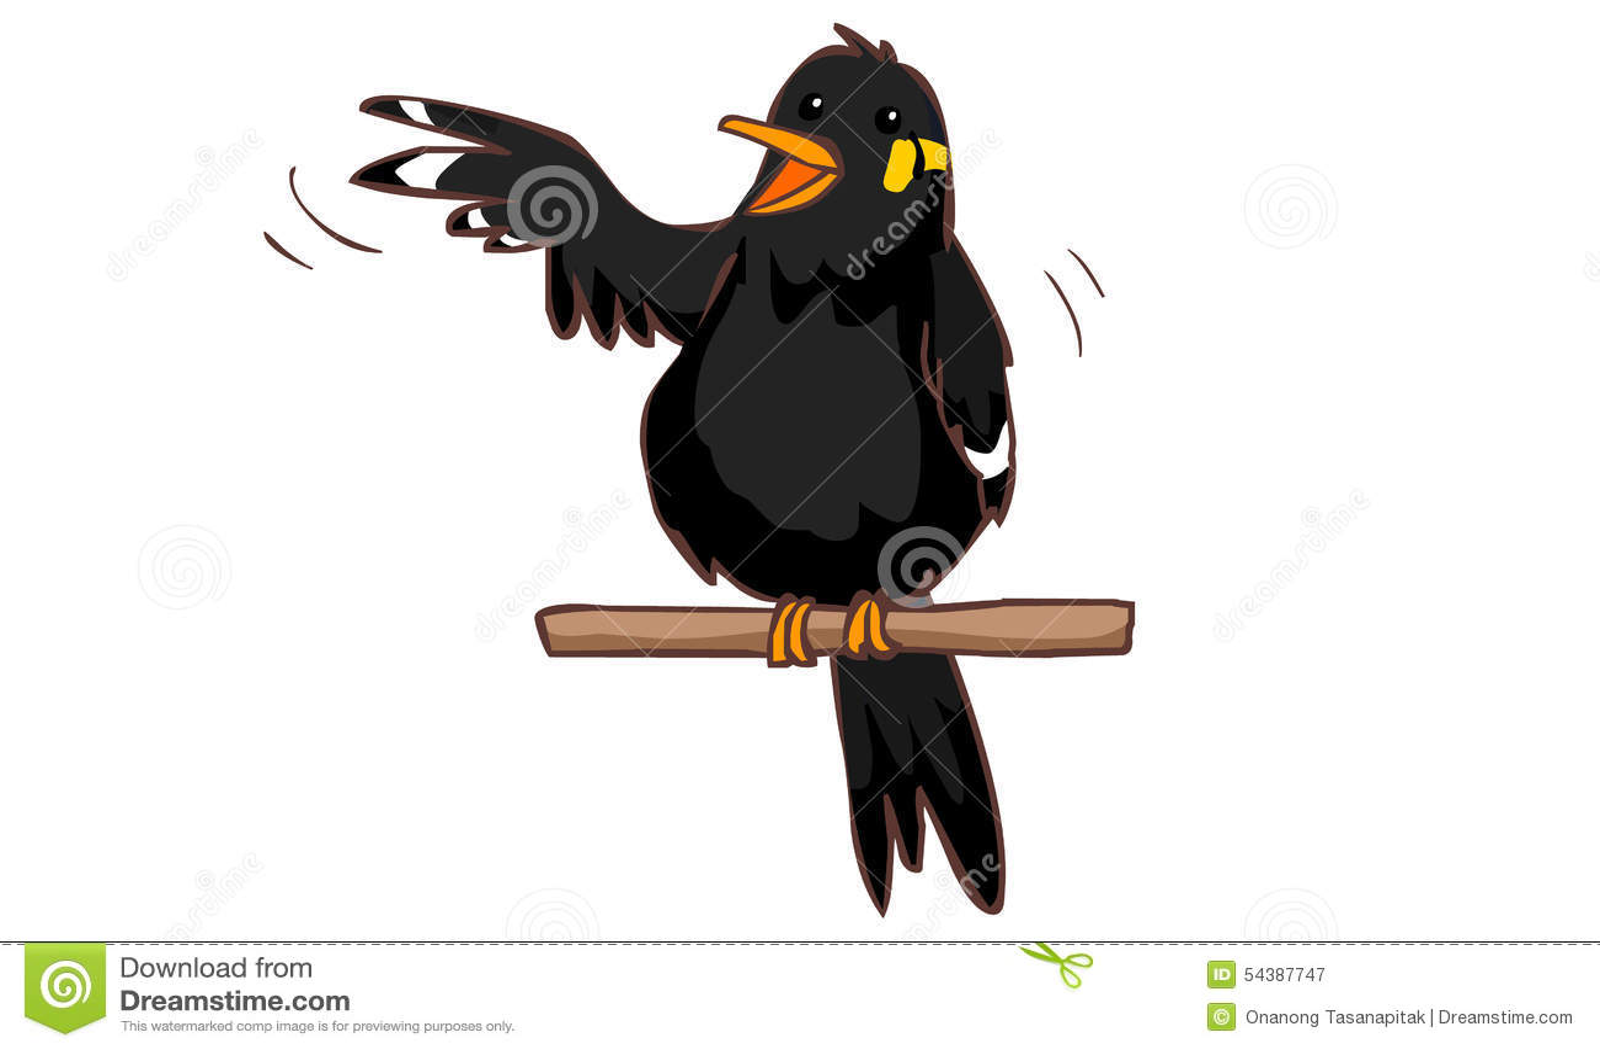 Talkative Hill Myna Bird Stock Vector - Image: 54387747 - photo#7